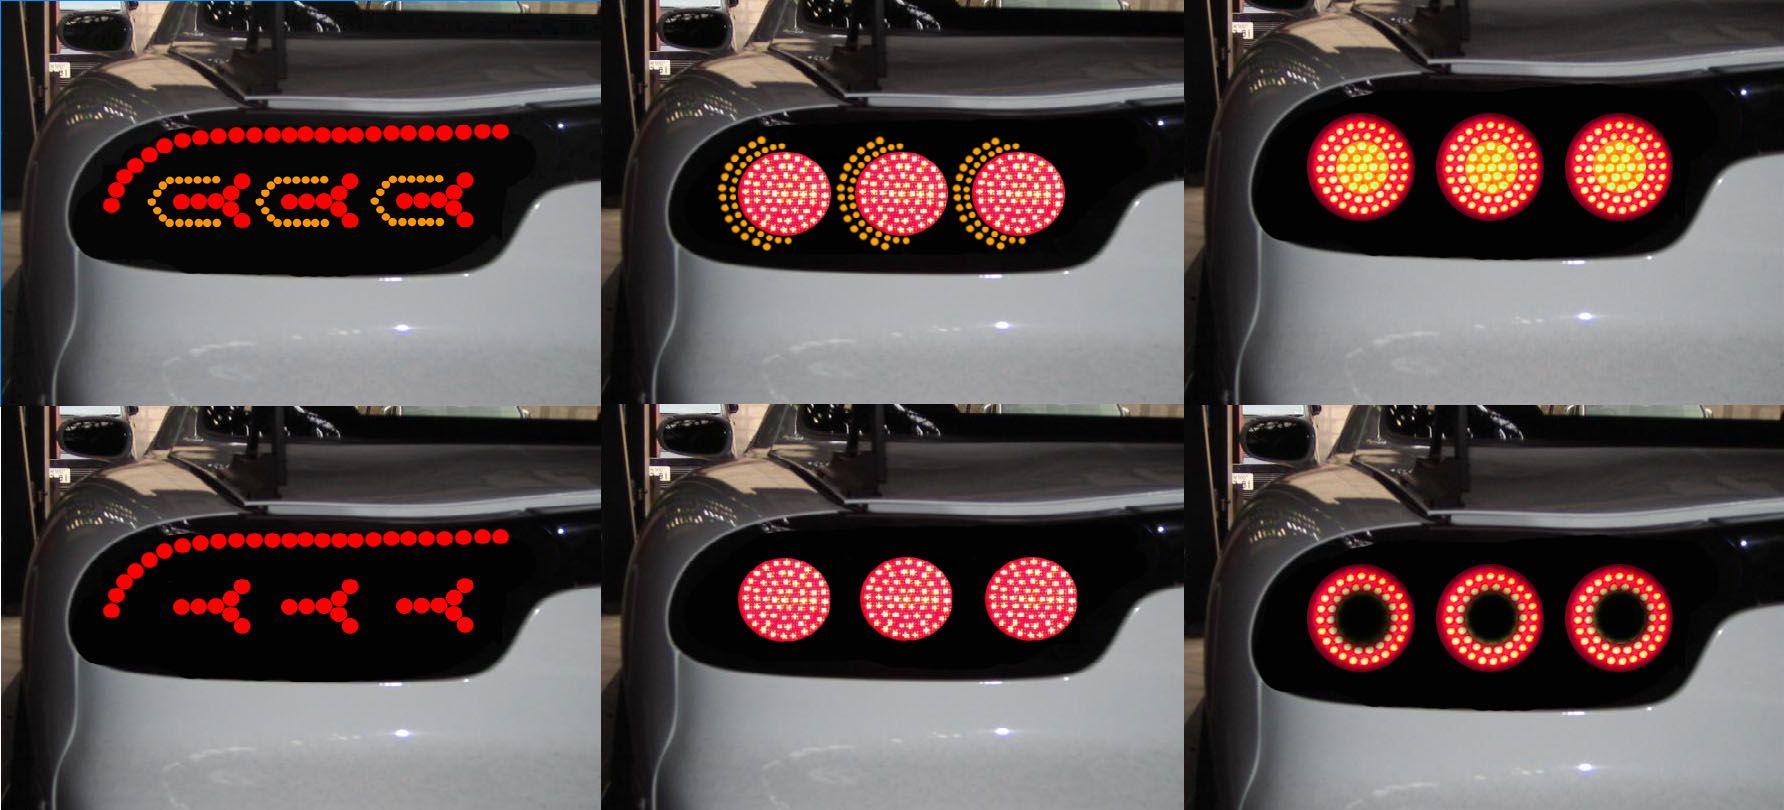 Fd Led Tail Lights Concepts Rx7club Com Auto Led Tail Lights